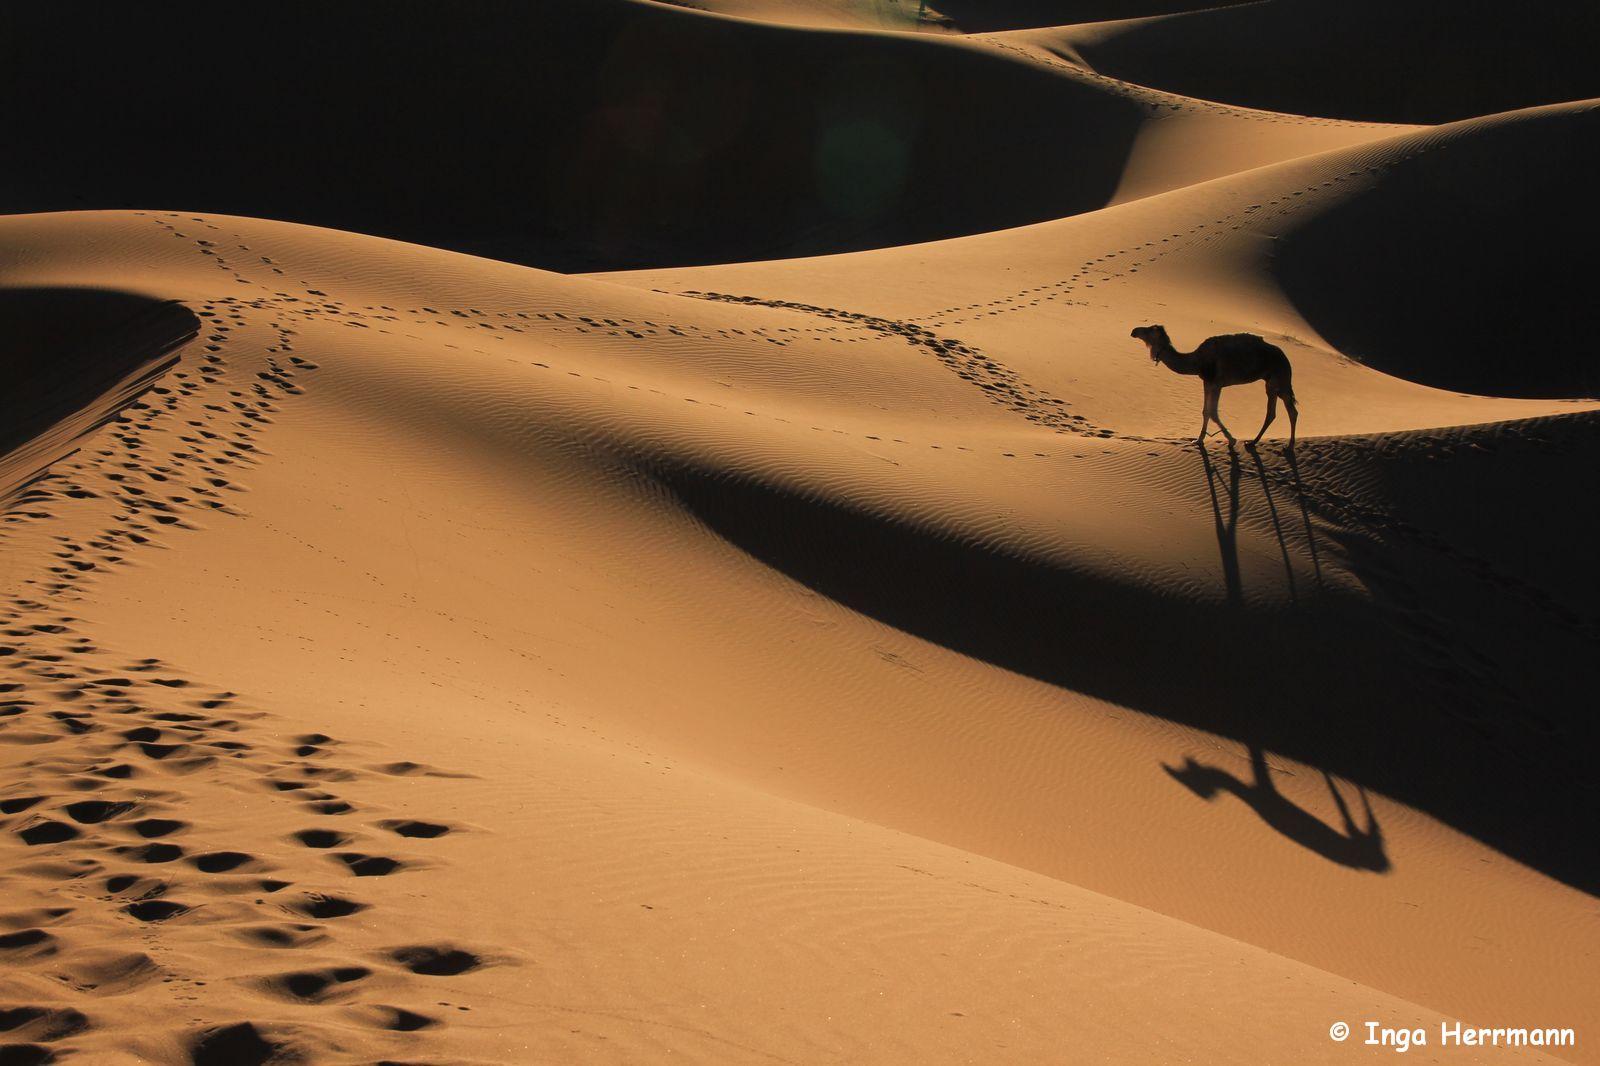 IMG_4462 - shadow